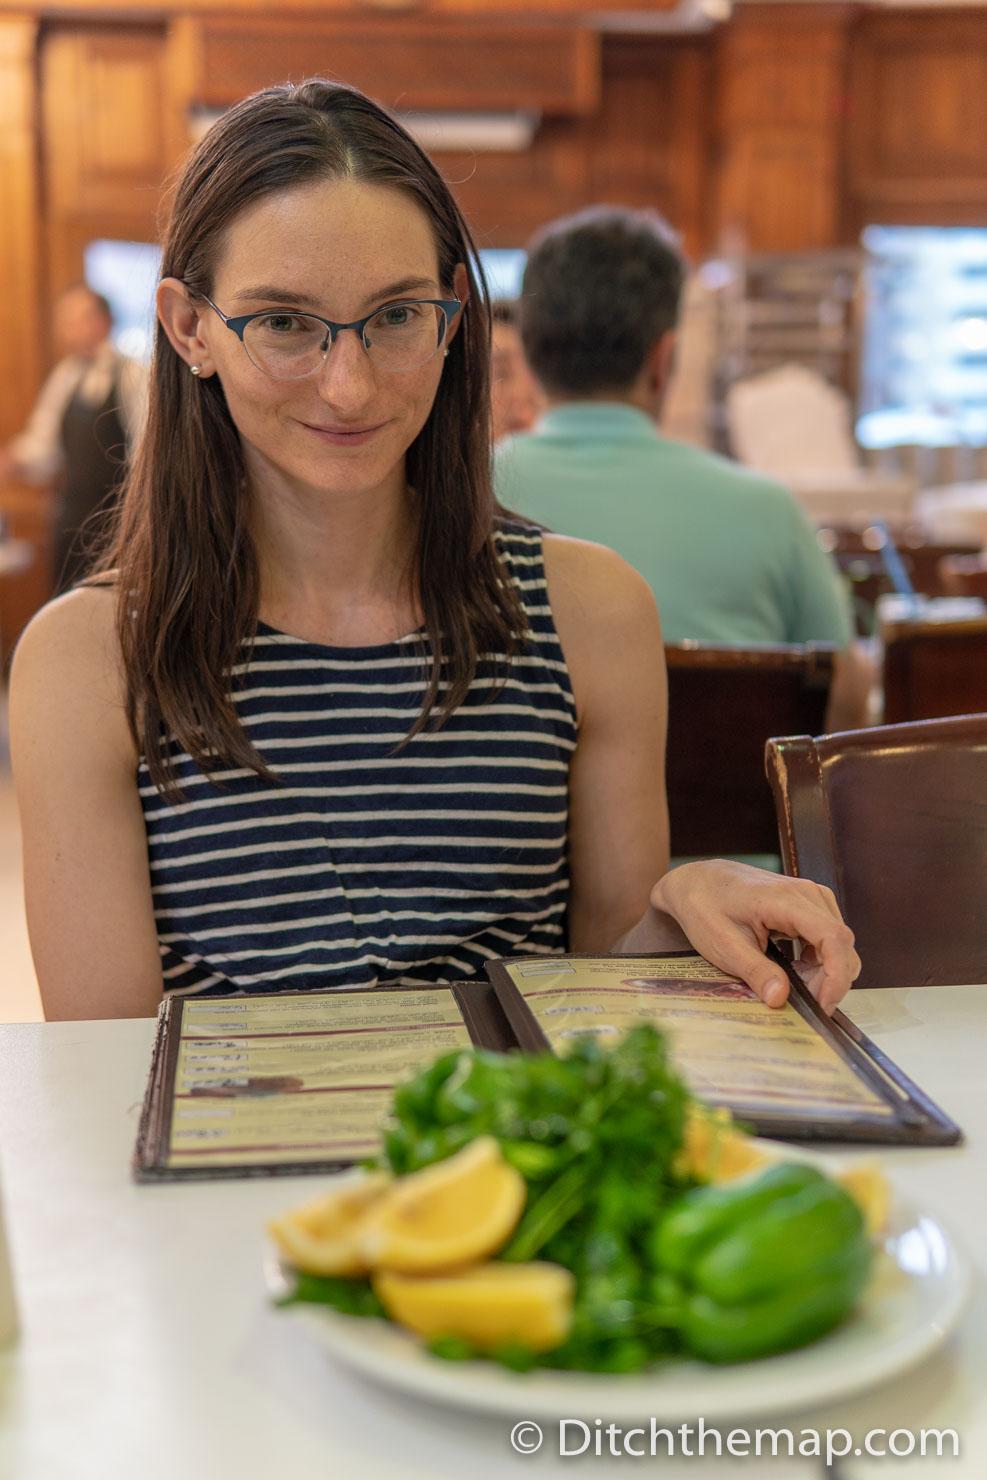 Ordering Food at Dinner